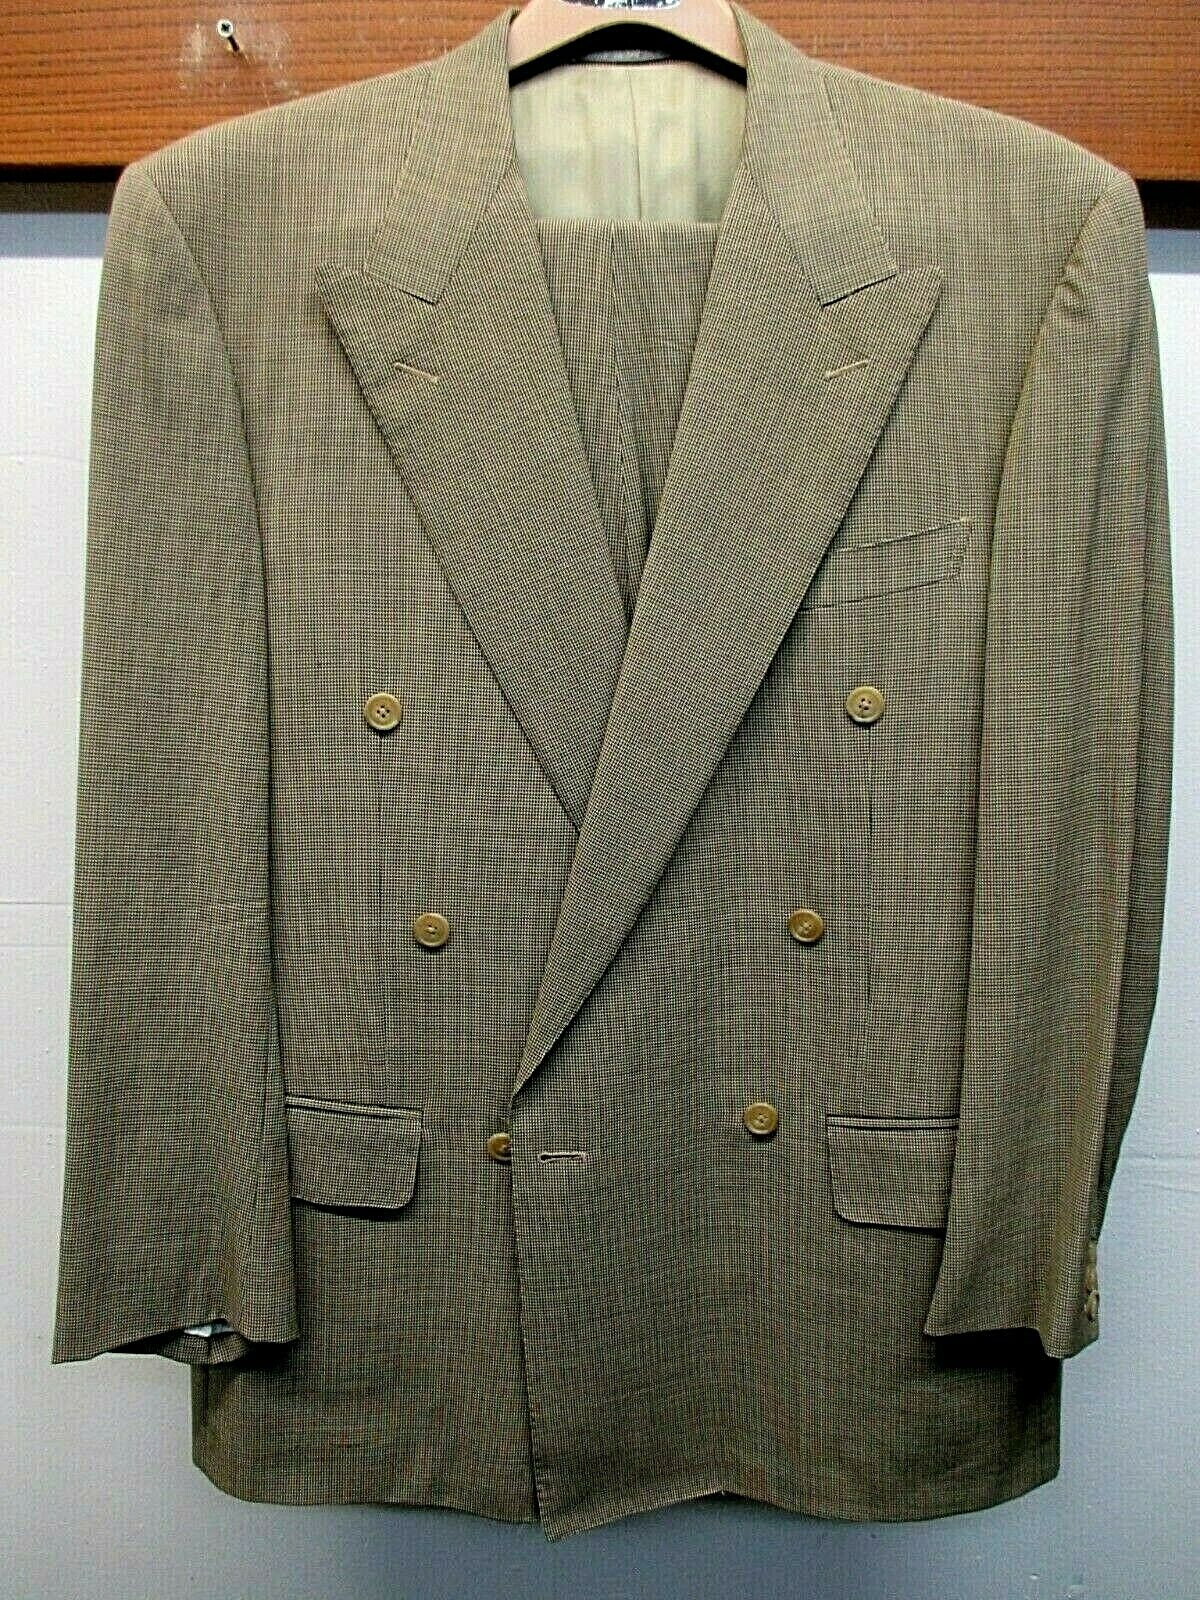 EUC Men's Ermenegildo Zegna High Performance Wool Dbl Brstd Suit Sz. 42r  Tan